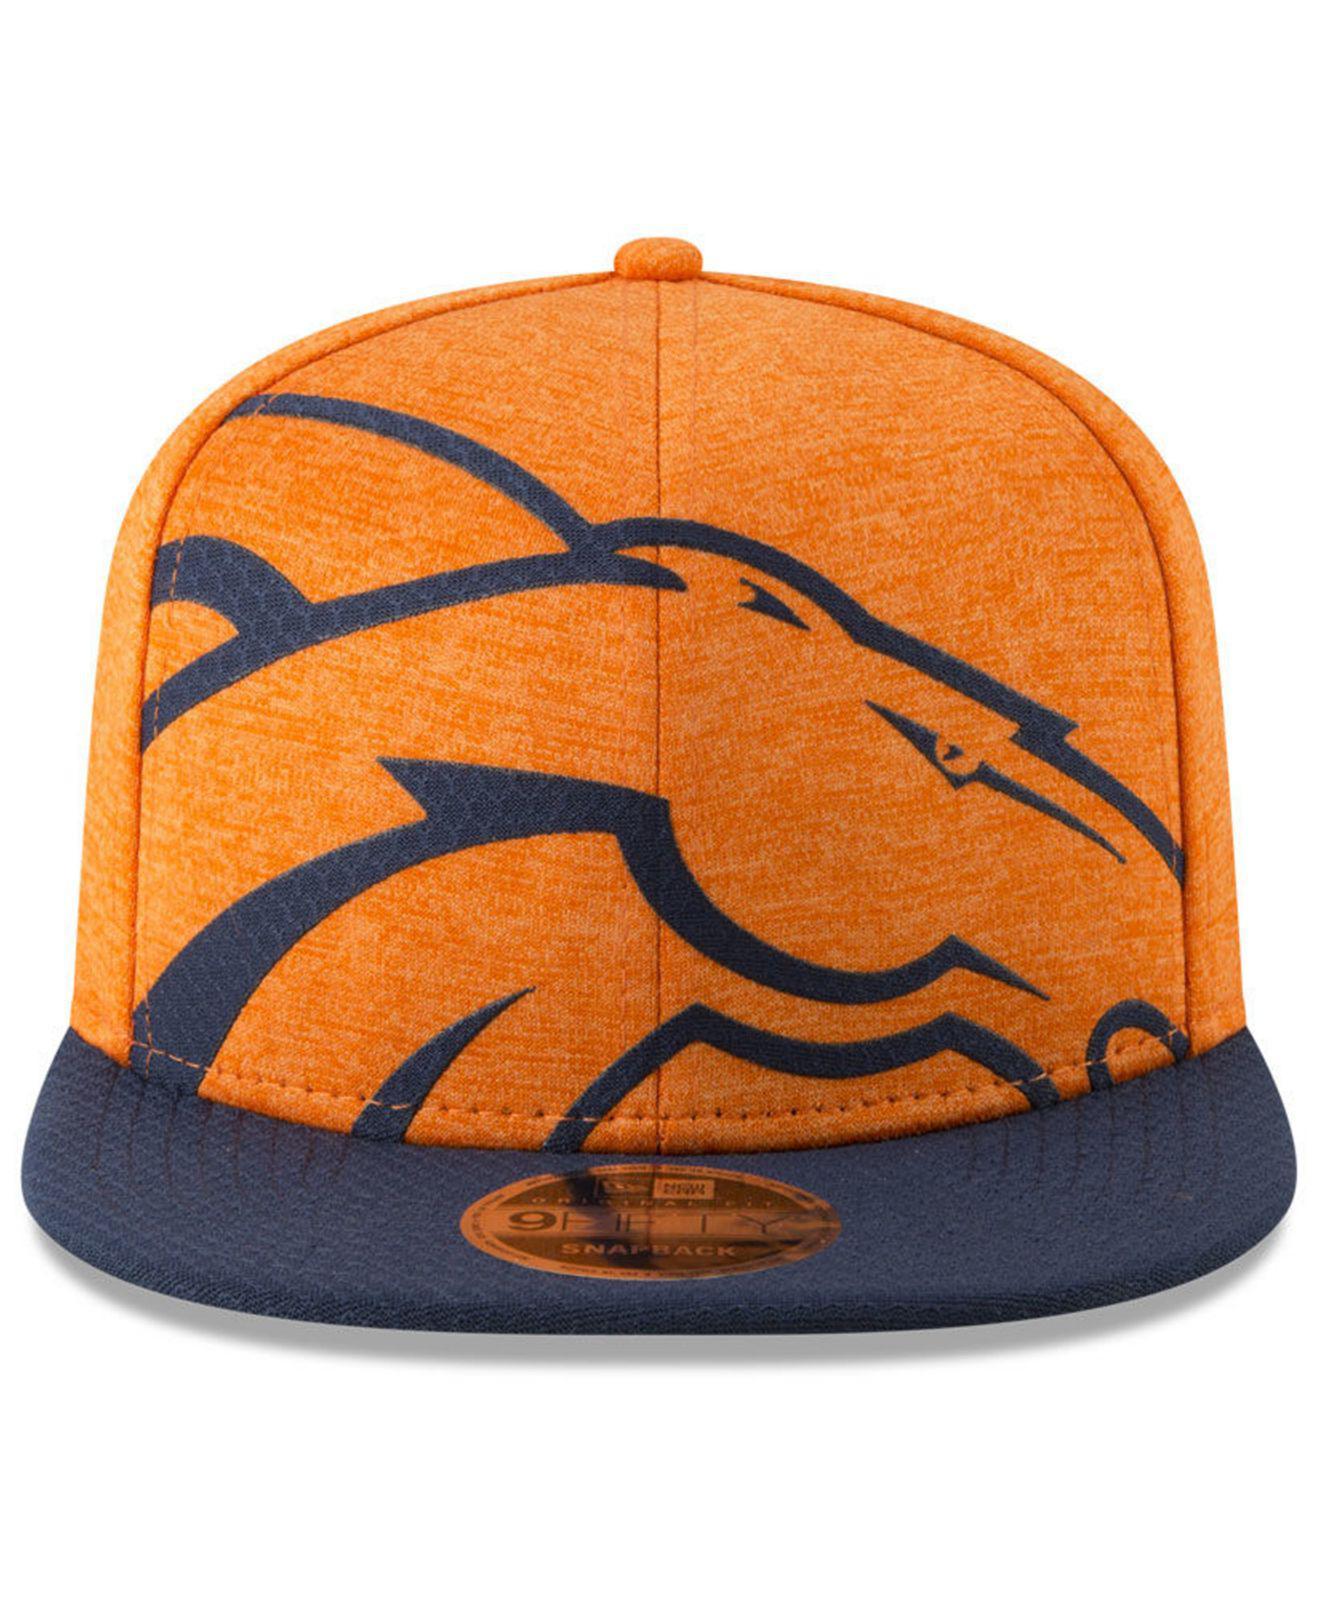 Lyst - KTZ Denver Broncos Oversized Laser Cut 9fifty Snapback Cap in Orange  for Men 5c481e165d6